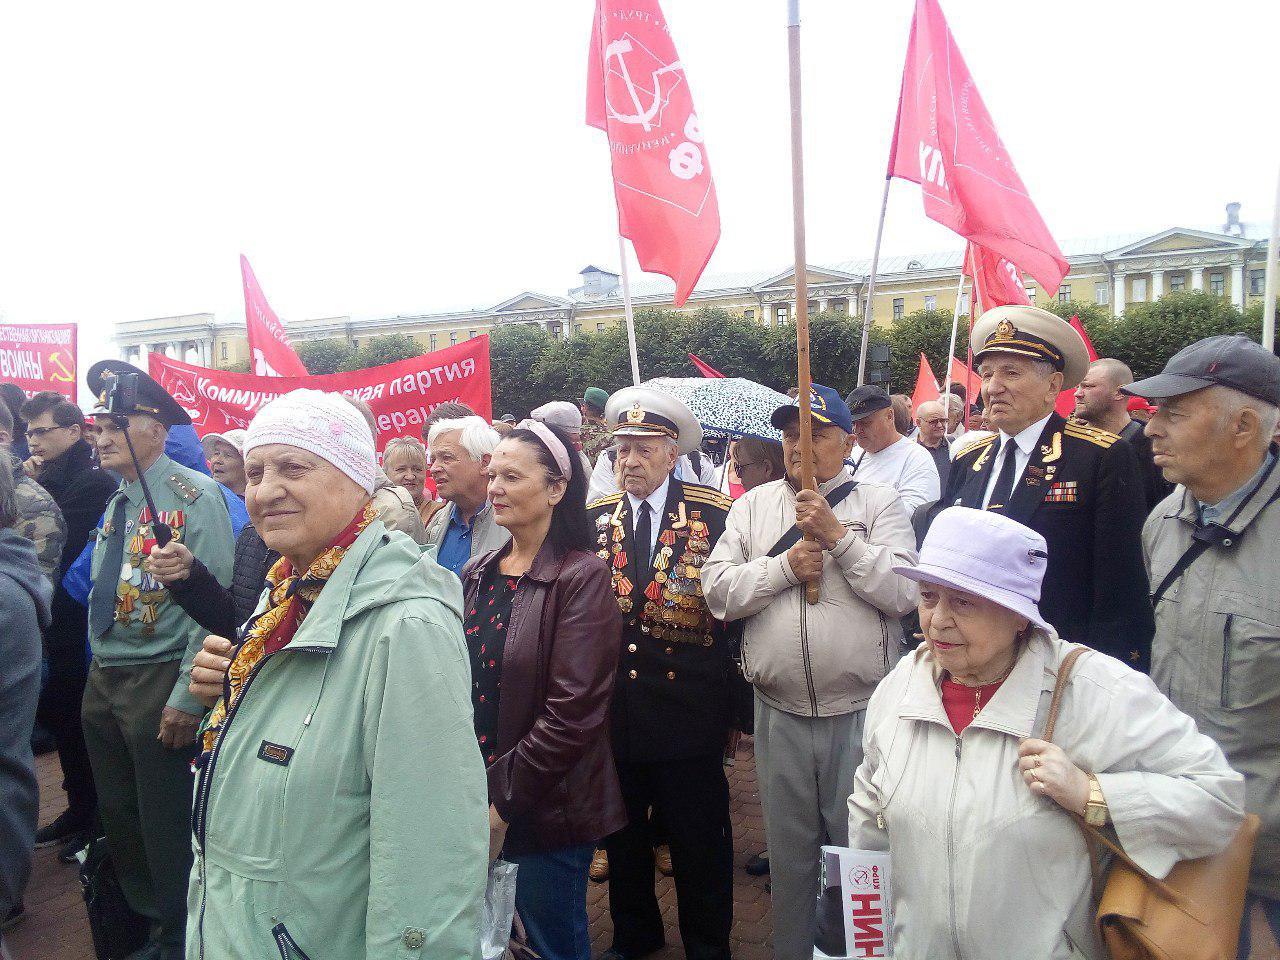 фото ЗакС политика Активисту Казаку не разрешили провести перформанс на митинге КПРФ